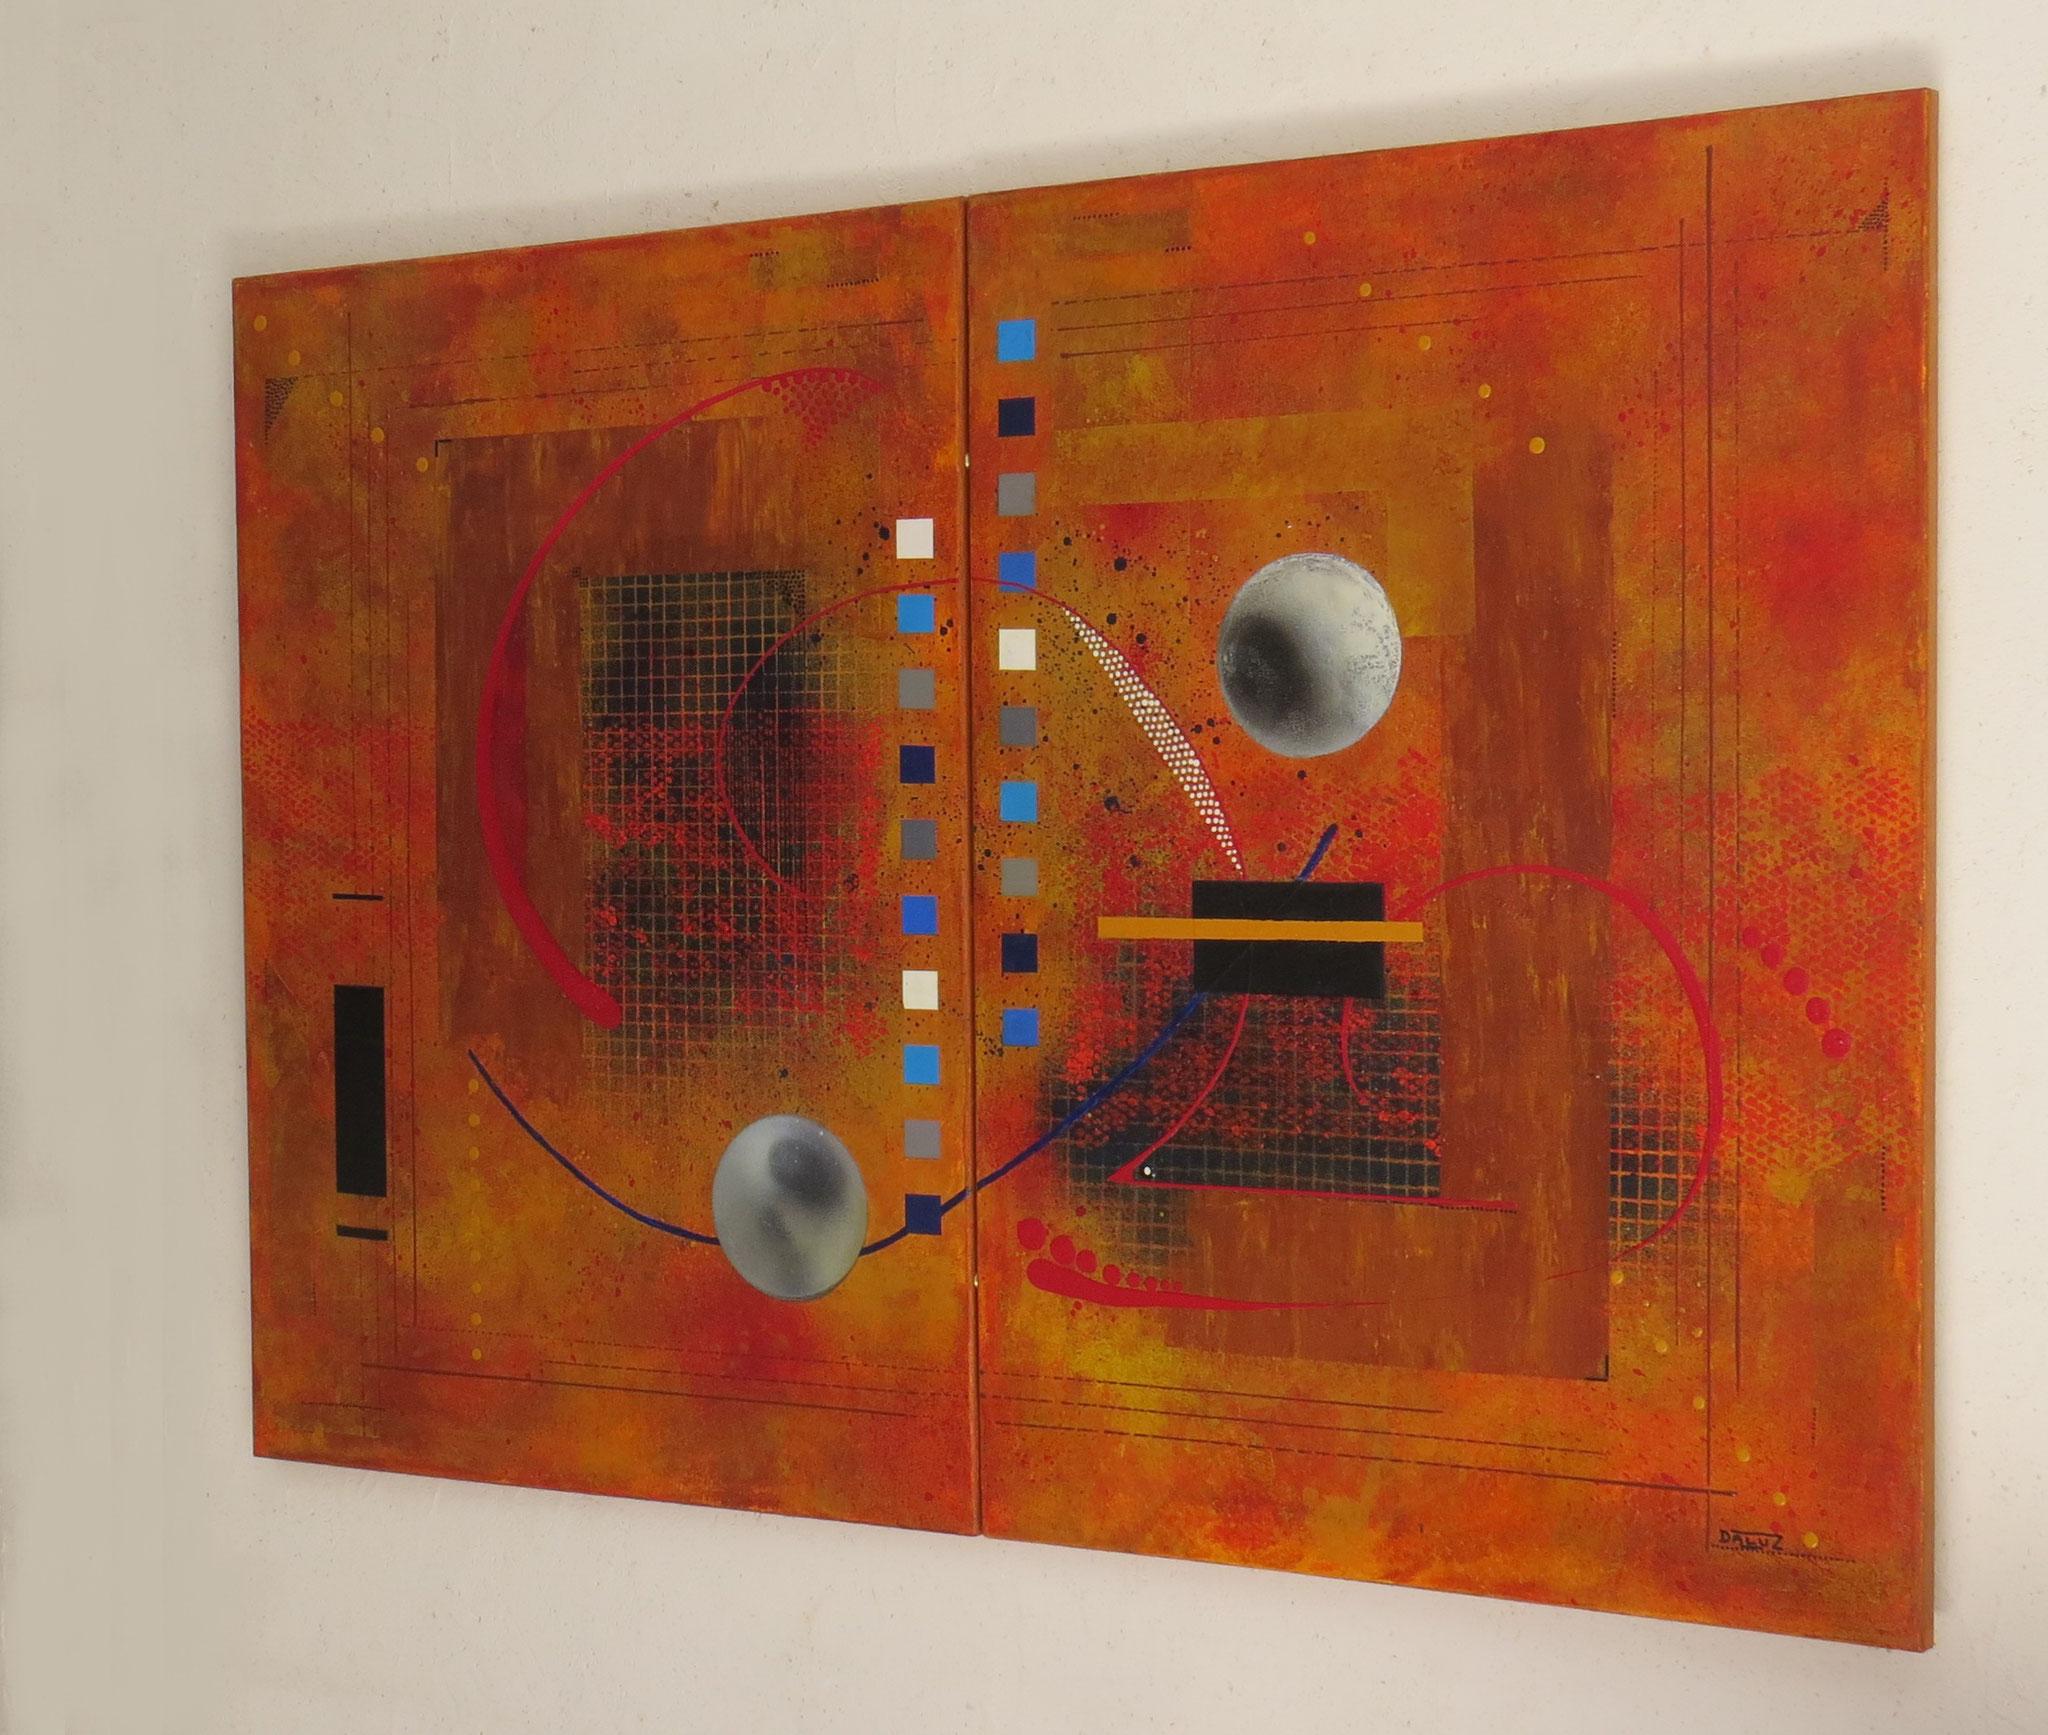 dzëta - vue côté2 - DALUZ GALEGO - peinture abstraite